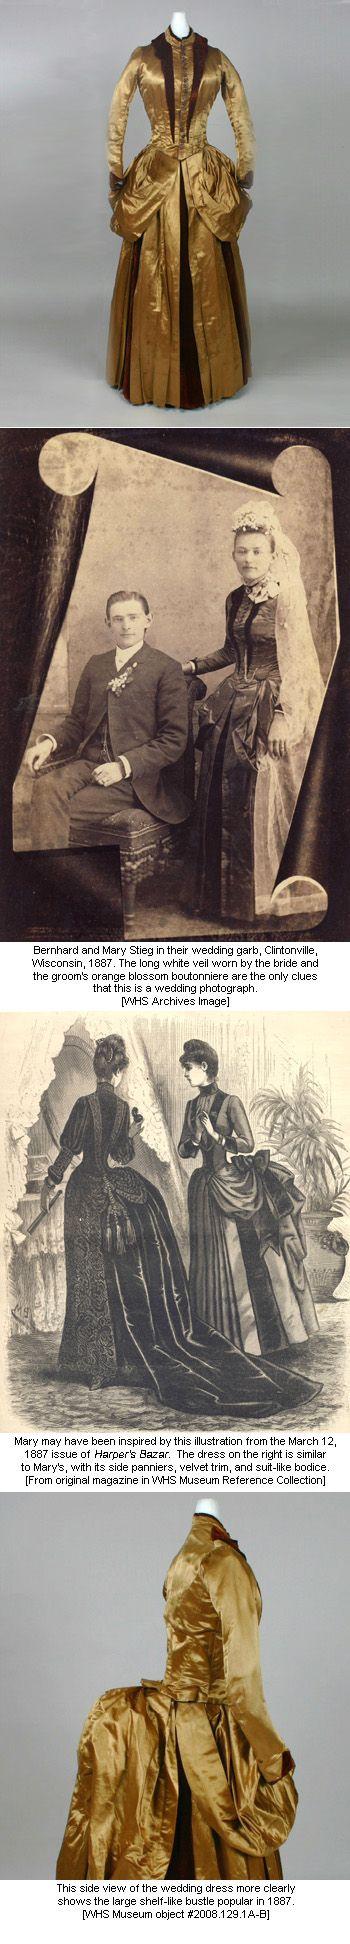 Silk gown worn by Miss Mary Dittberner at her 1887 wedding to Bernhard Stieg in Clintonville, Wisconsin.